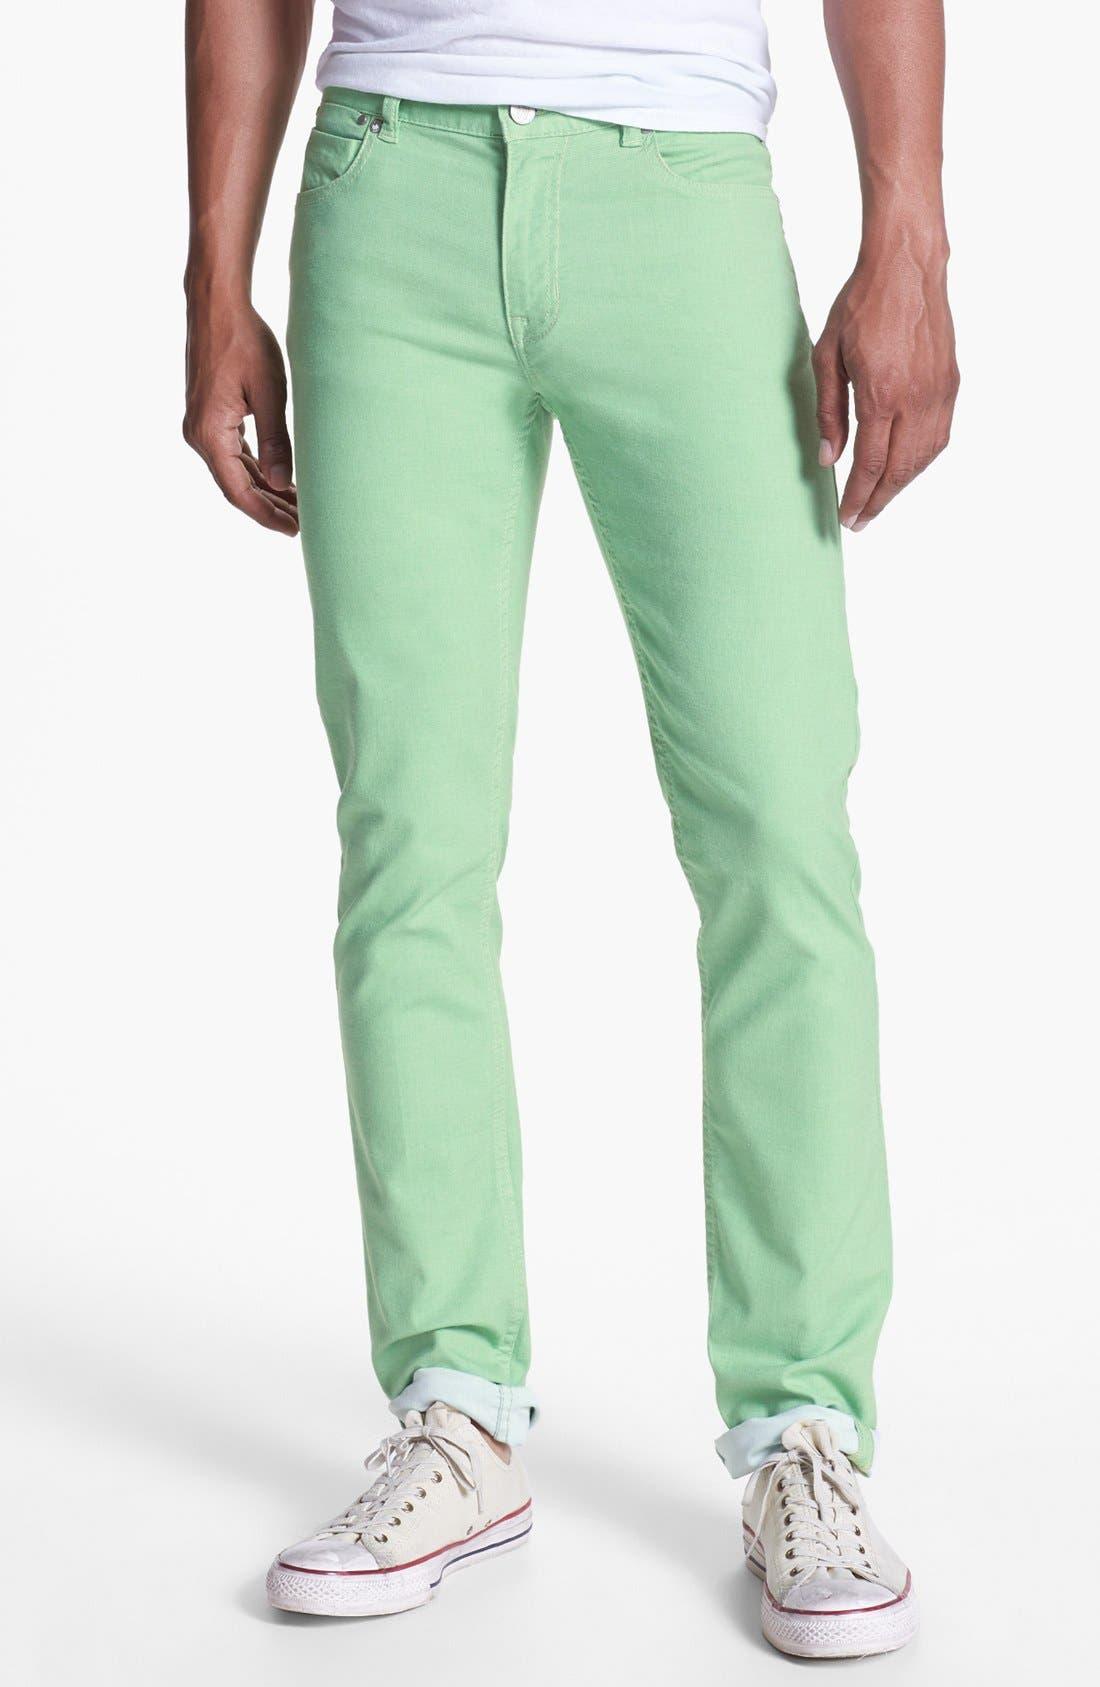 Alternate Image 1 Selected - Williamsburg Garment Company 'S. 4th Street' Skinny Stretch Pants